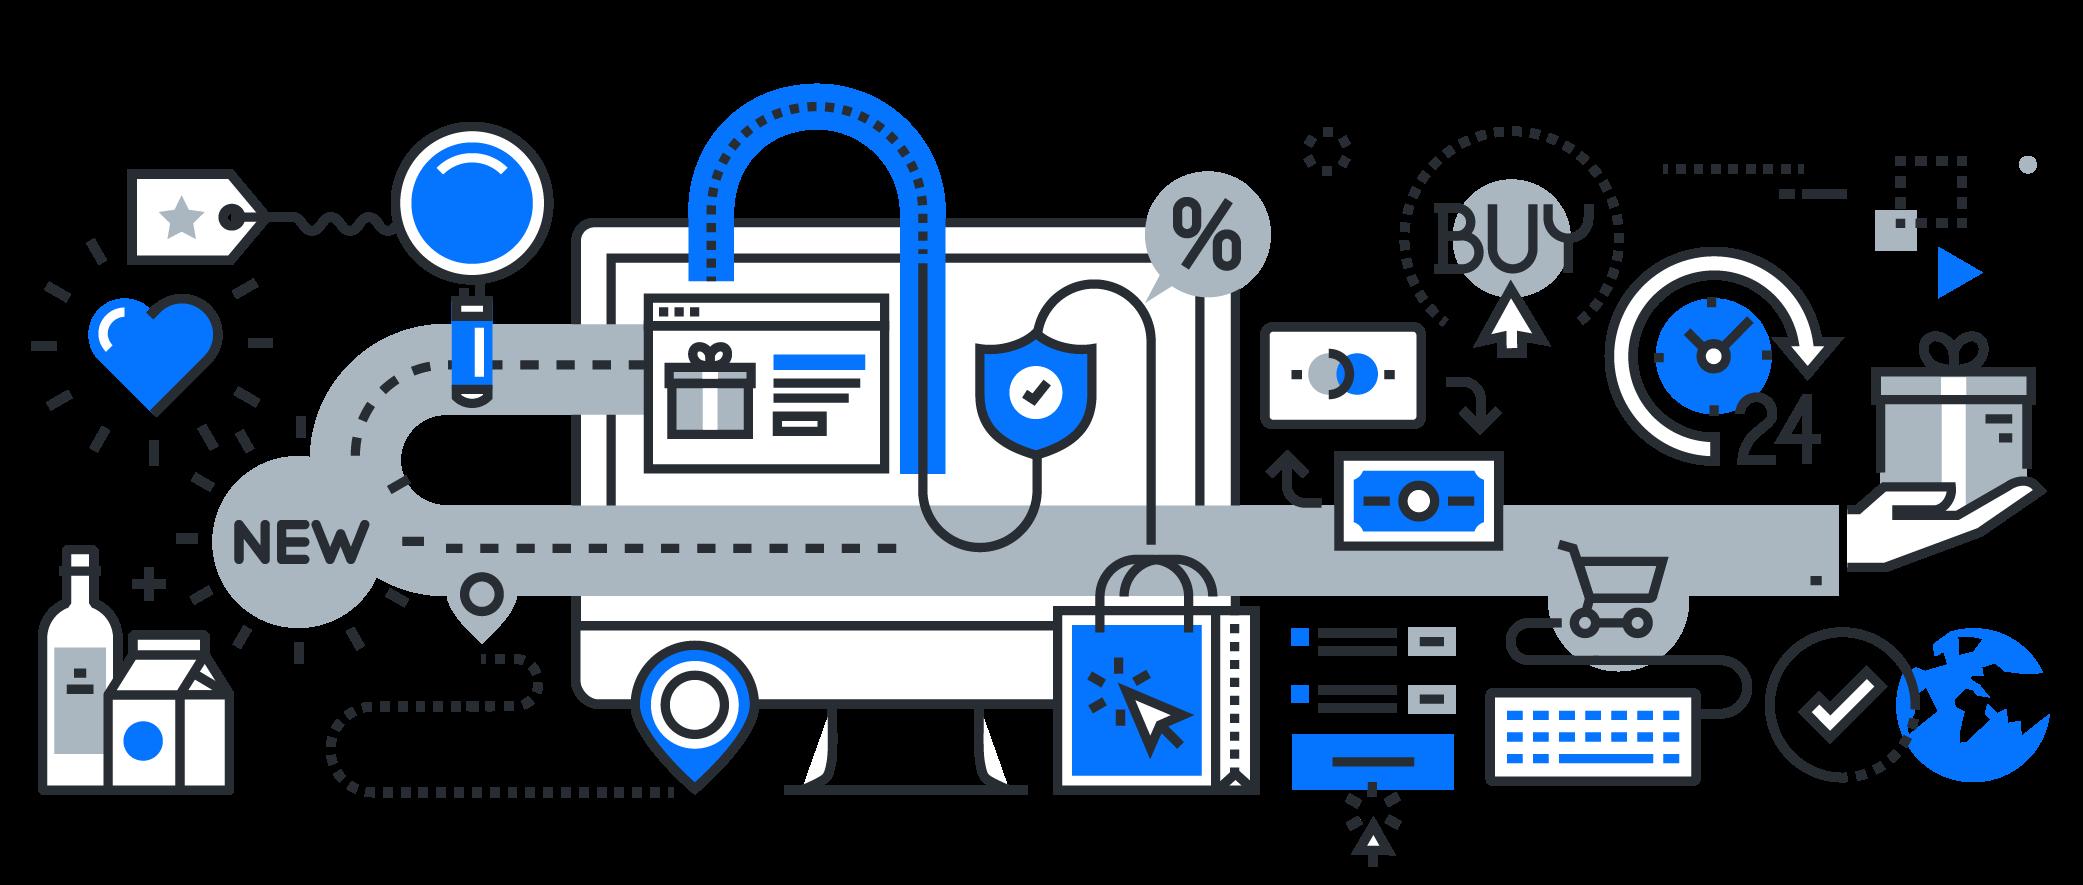 AMA16 ecommerce e1487180032561 - Website Maintenance Service